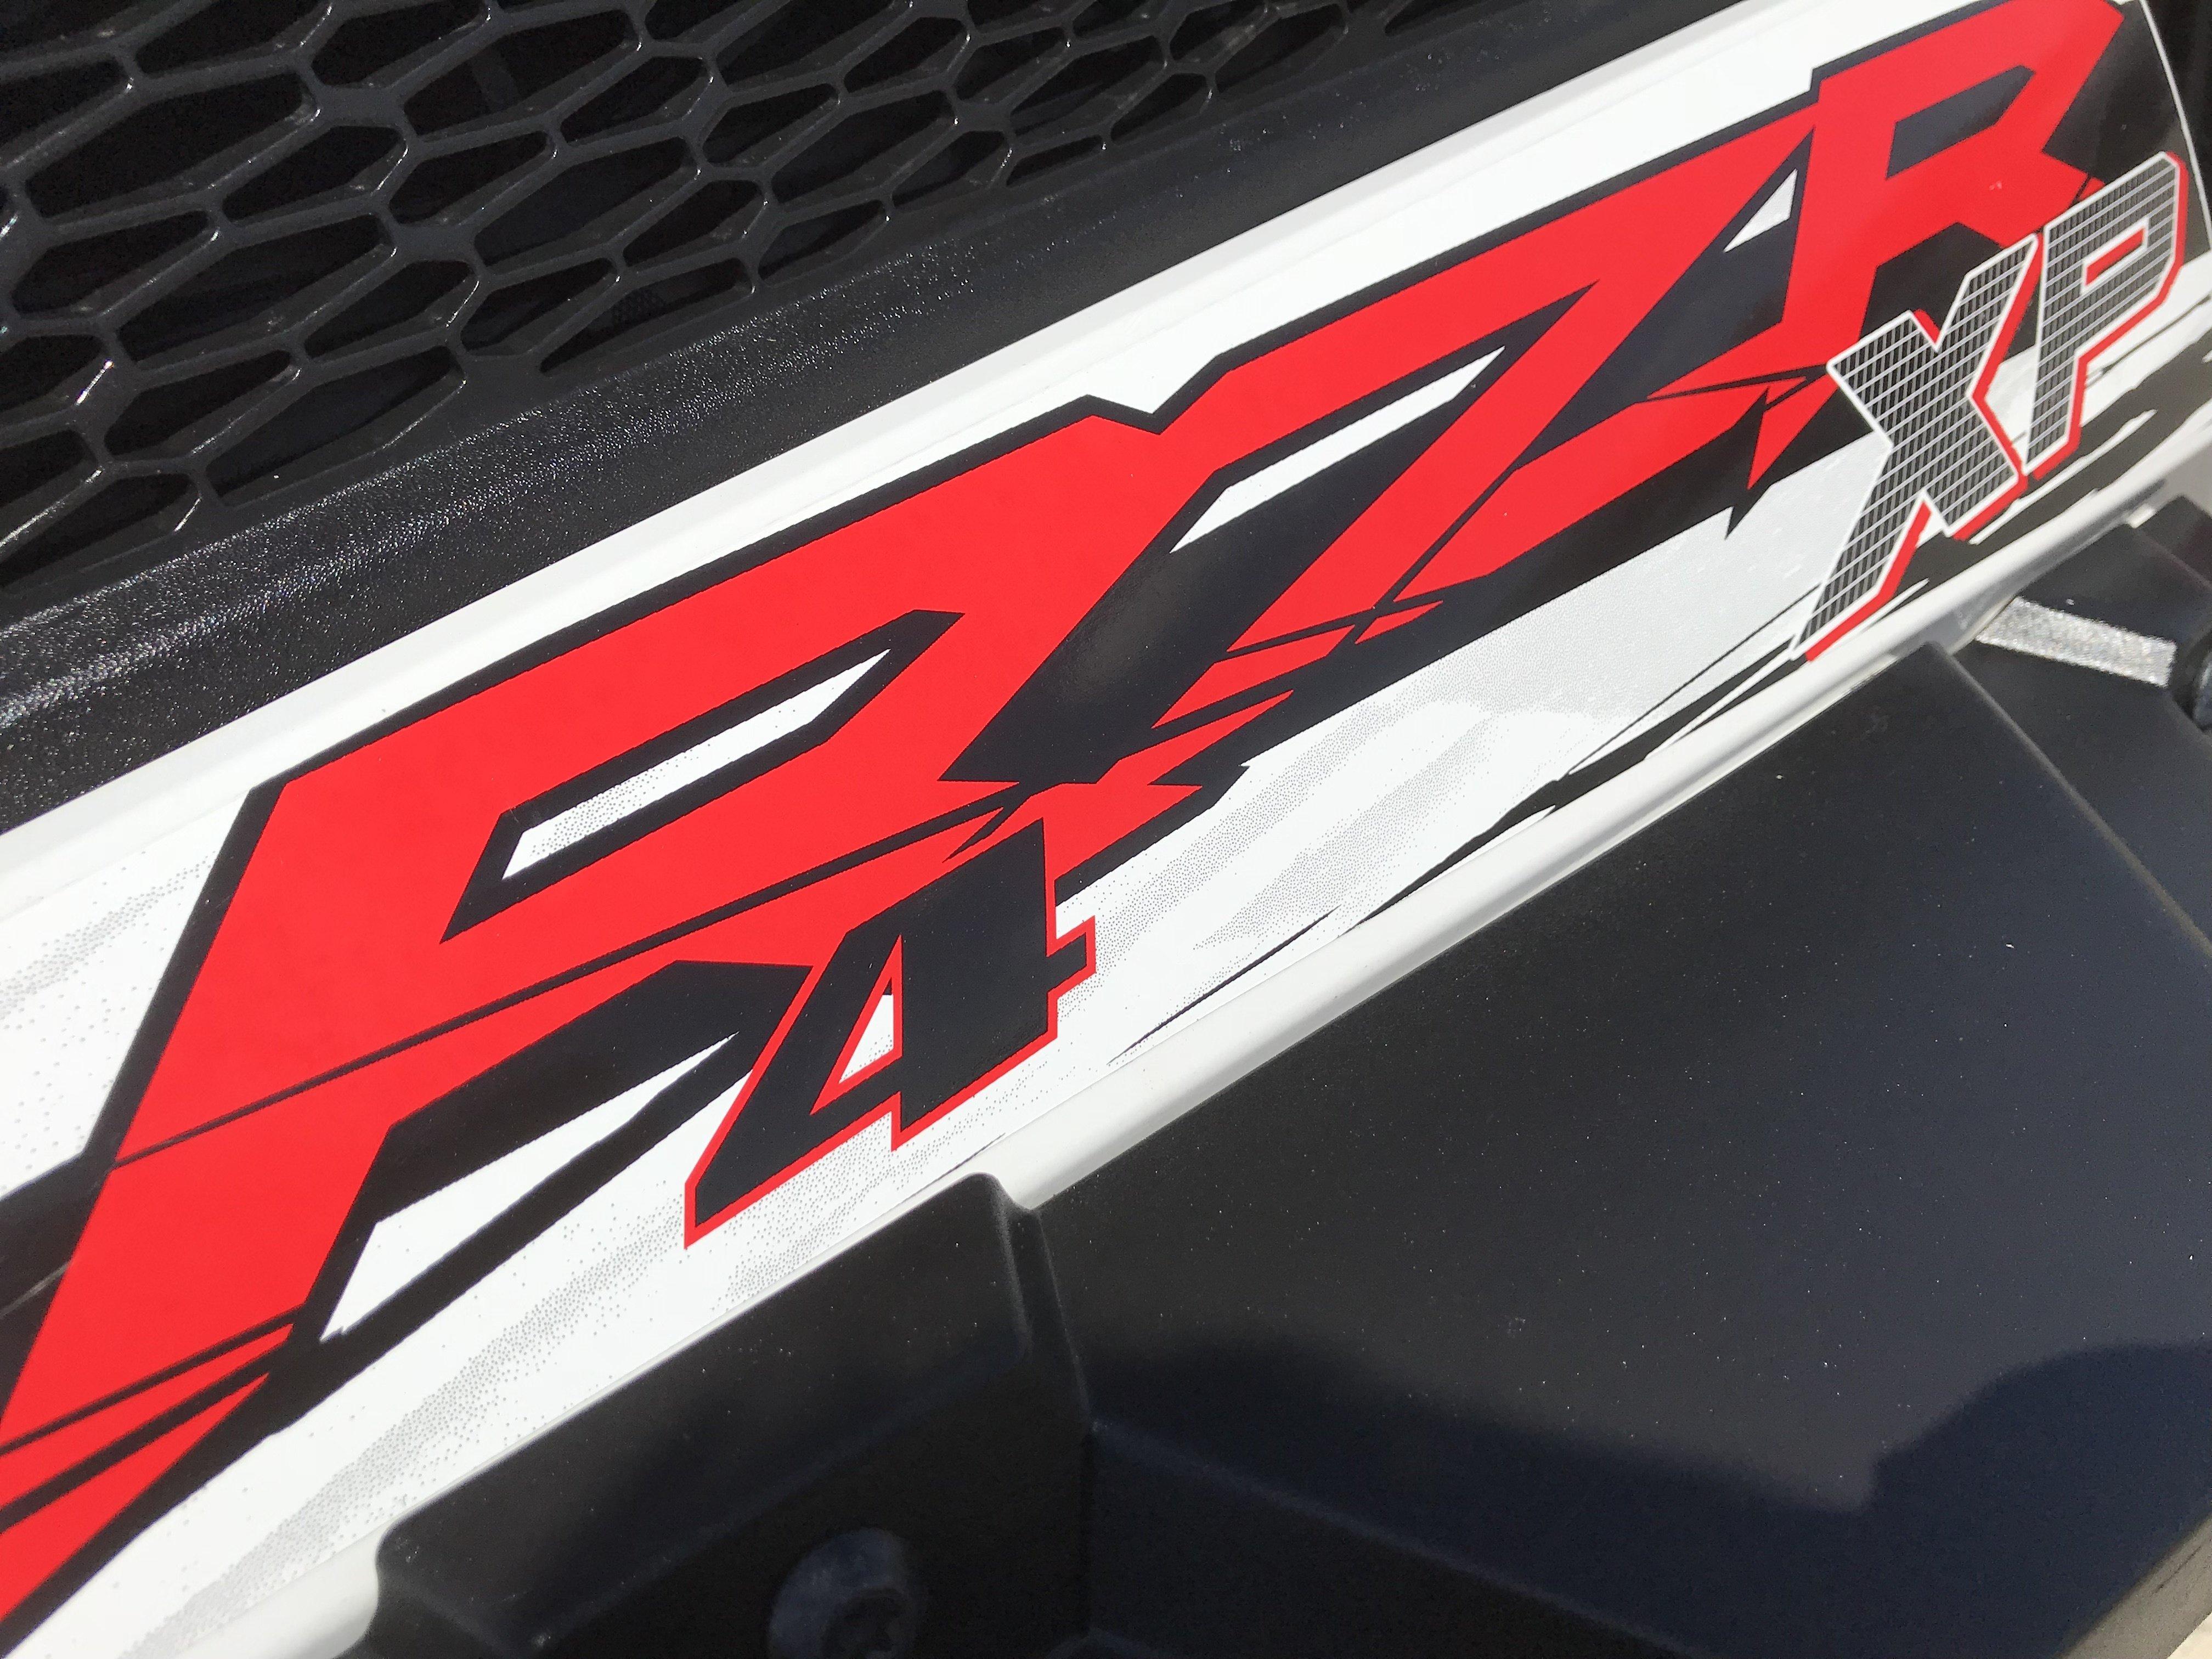 2014 Polaris RZR-4 XP 1000 EPS - 6 Month Warranty